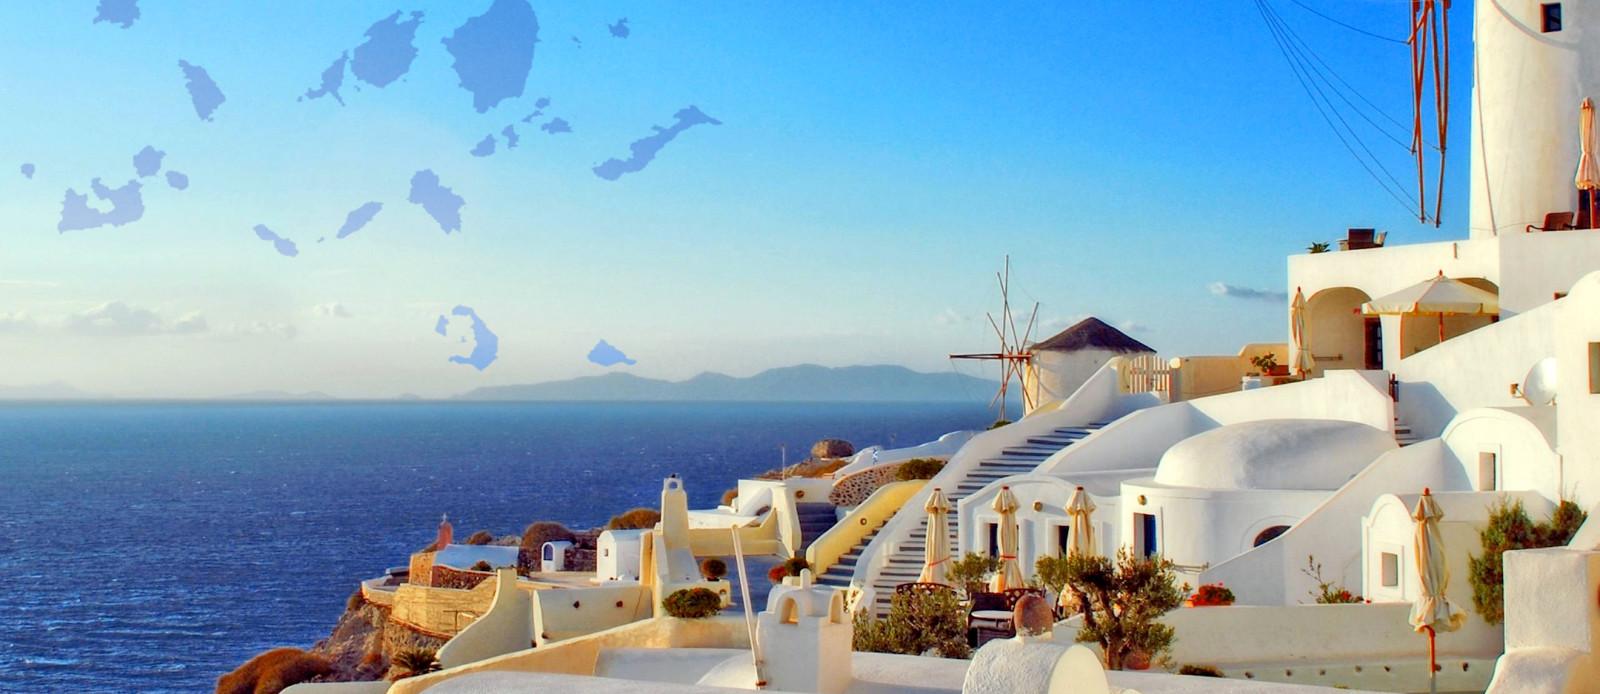 Sailing holidays in Greece Cyclades Islands